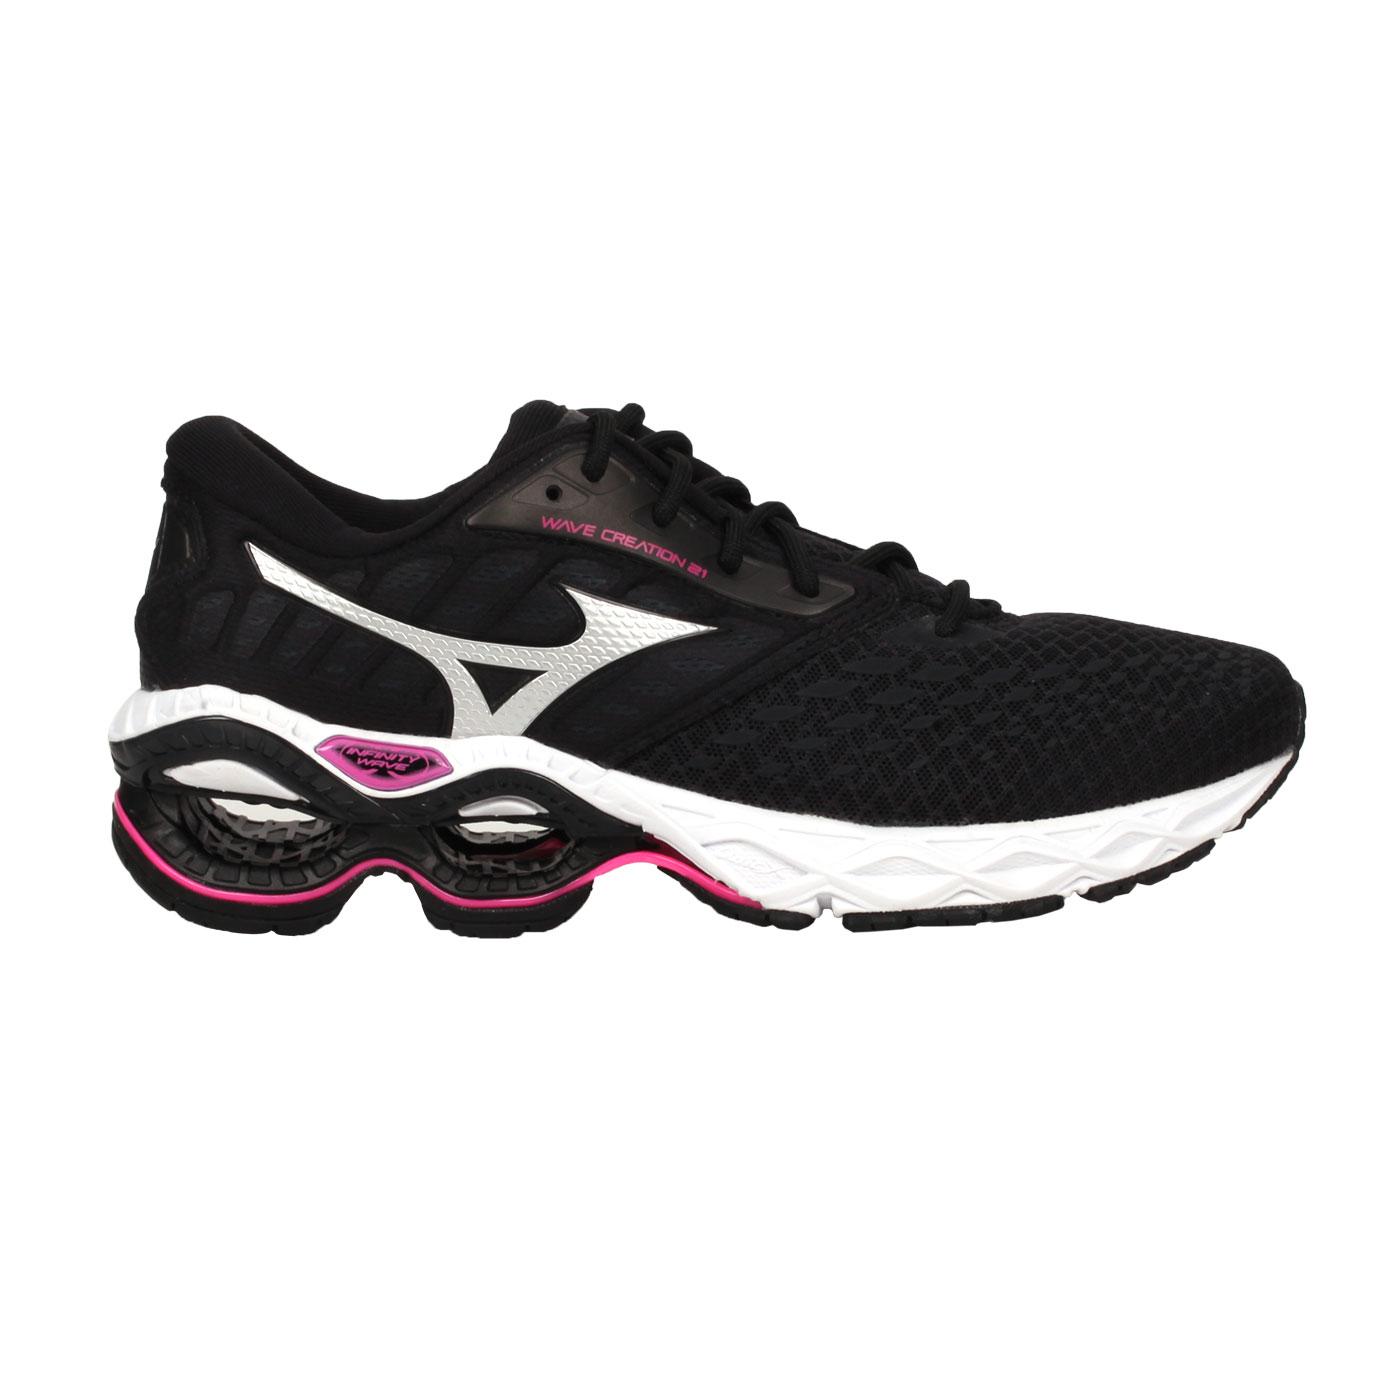 MIZUNO 女款慢跑鞋  @WAVE CREATION 21@J1GD200116 - 黑銀桃紅